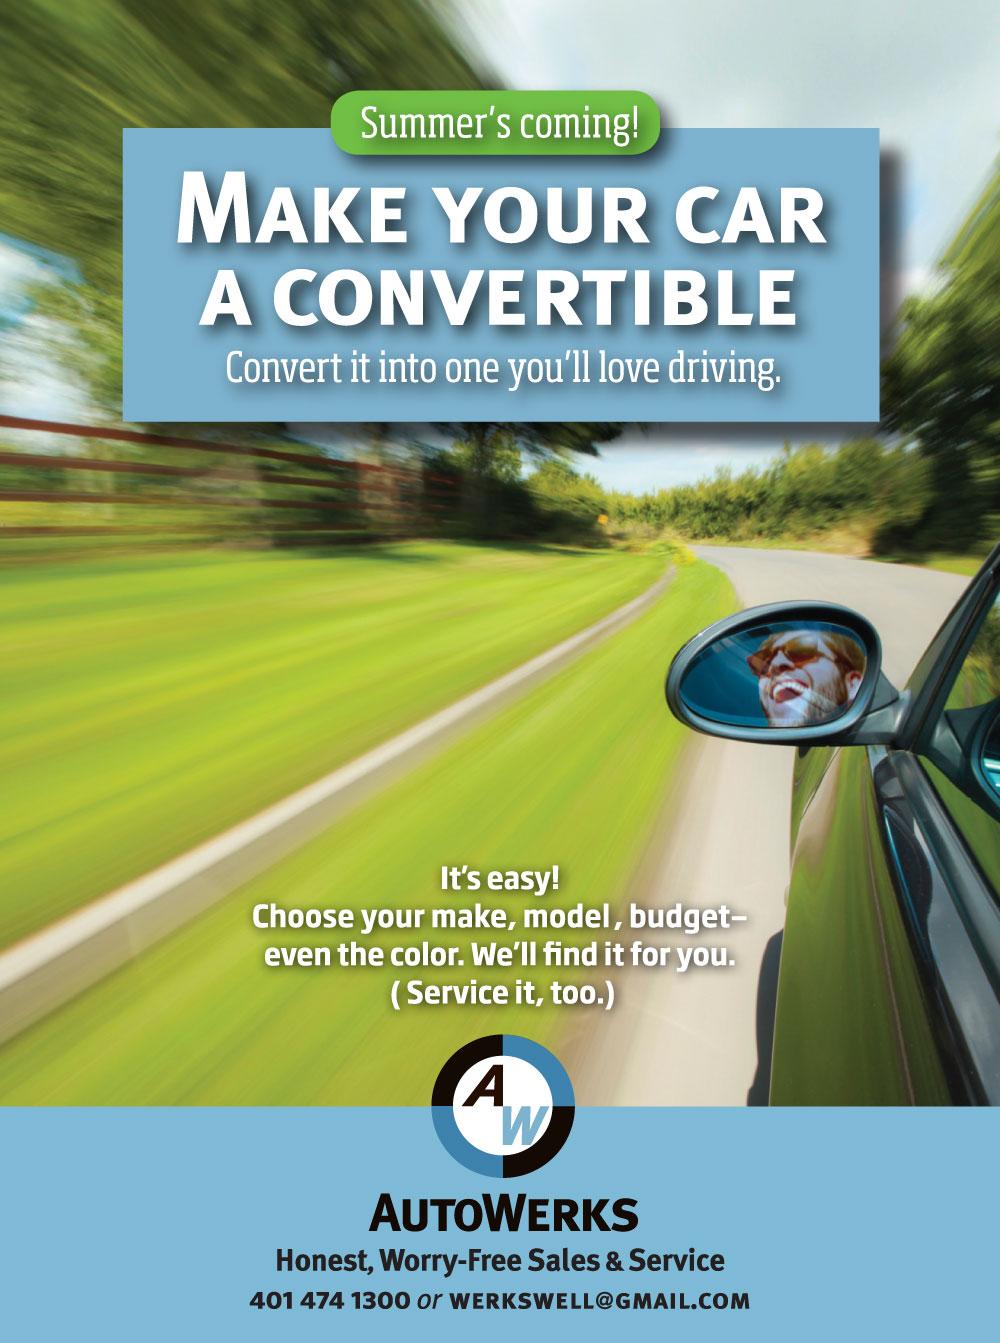 Auto Werks ad